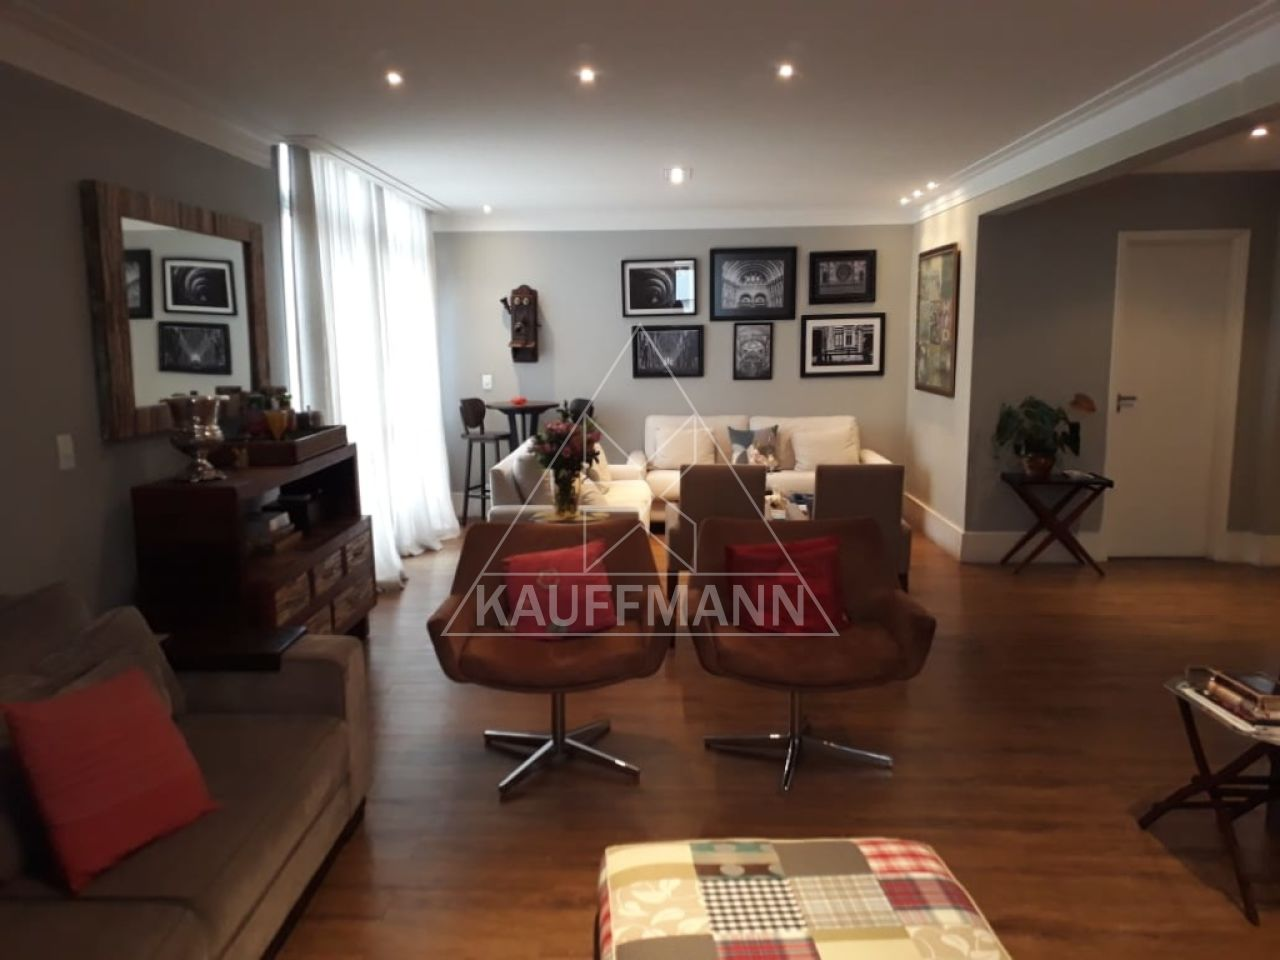 apartamento-venda-sao-paulo-jardim-paulista-3dormitorios-3suites-1vaga-174m2-Foto5